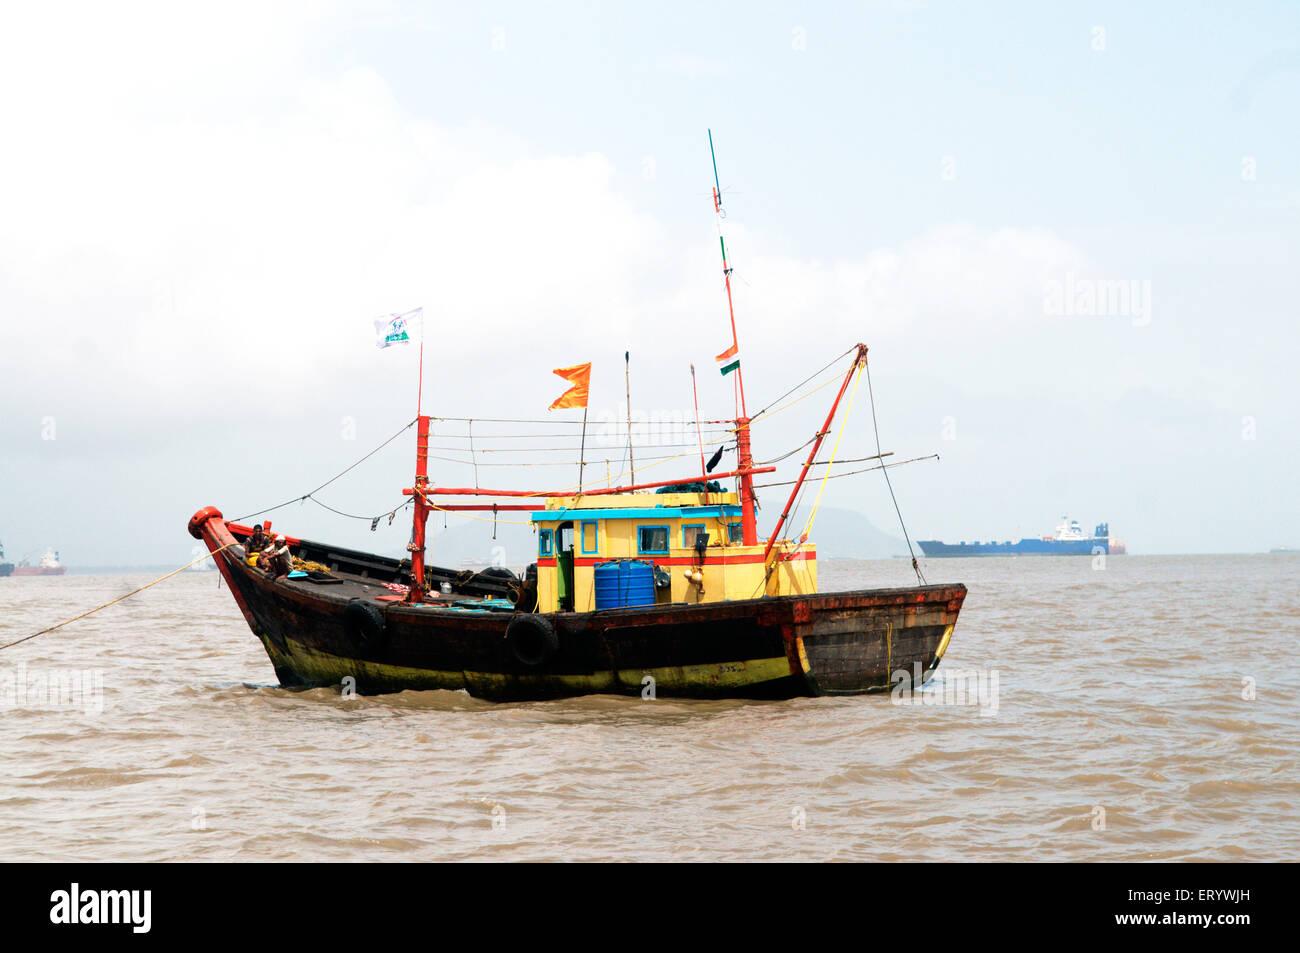 Pesca en barco de arrastre en el mar ; Bombay ; Bombay ; Bombay ; Maharashtra ; India ; asia Foto de stock